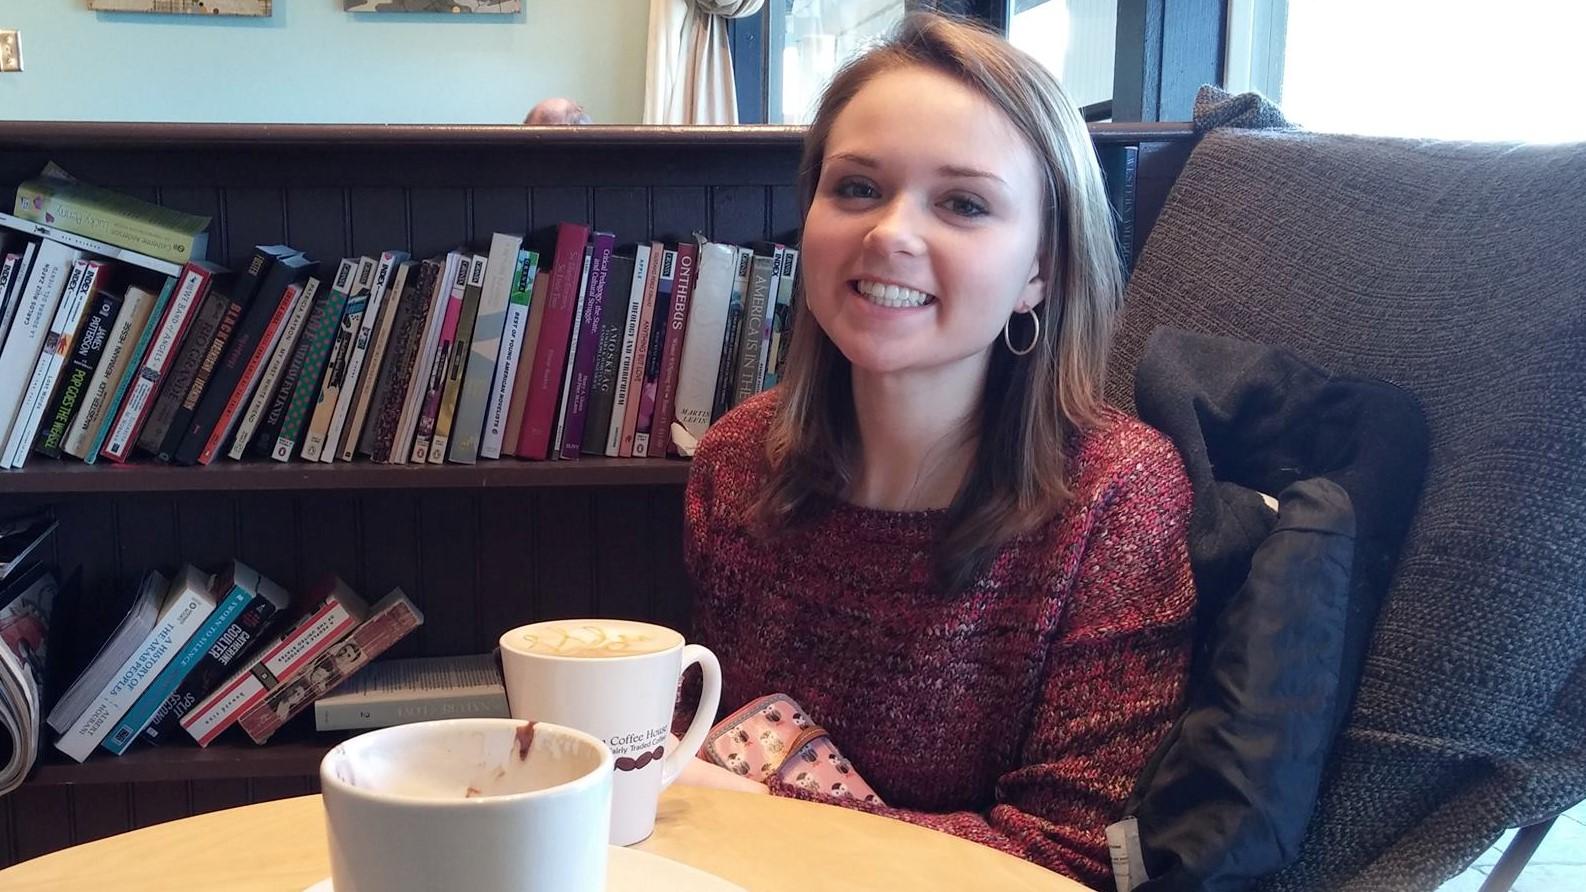 Leah Middleton - Neuroscience PhD Student (2018 - present)B.A., Mount Holyoke Collegeleahjmid@pennmedicine.upenn.edu